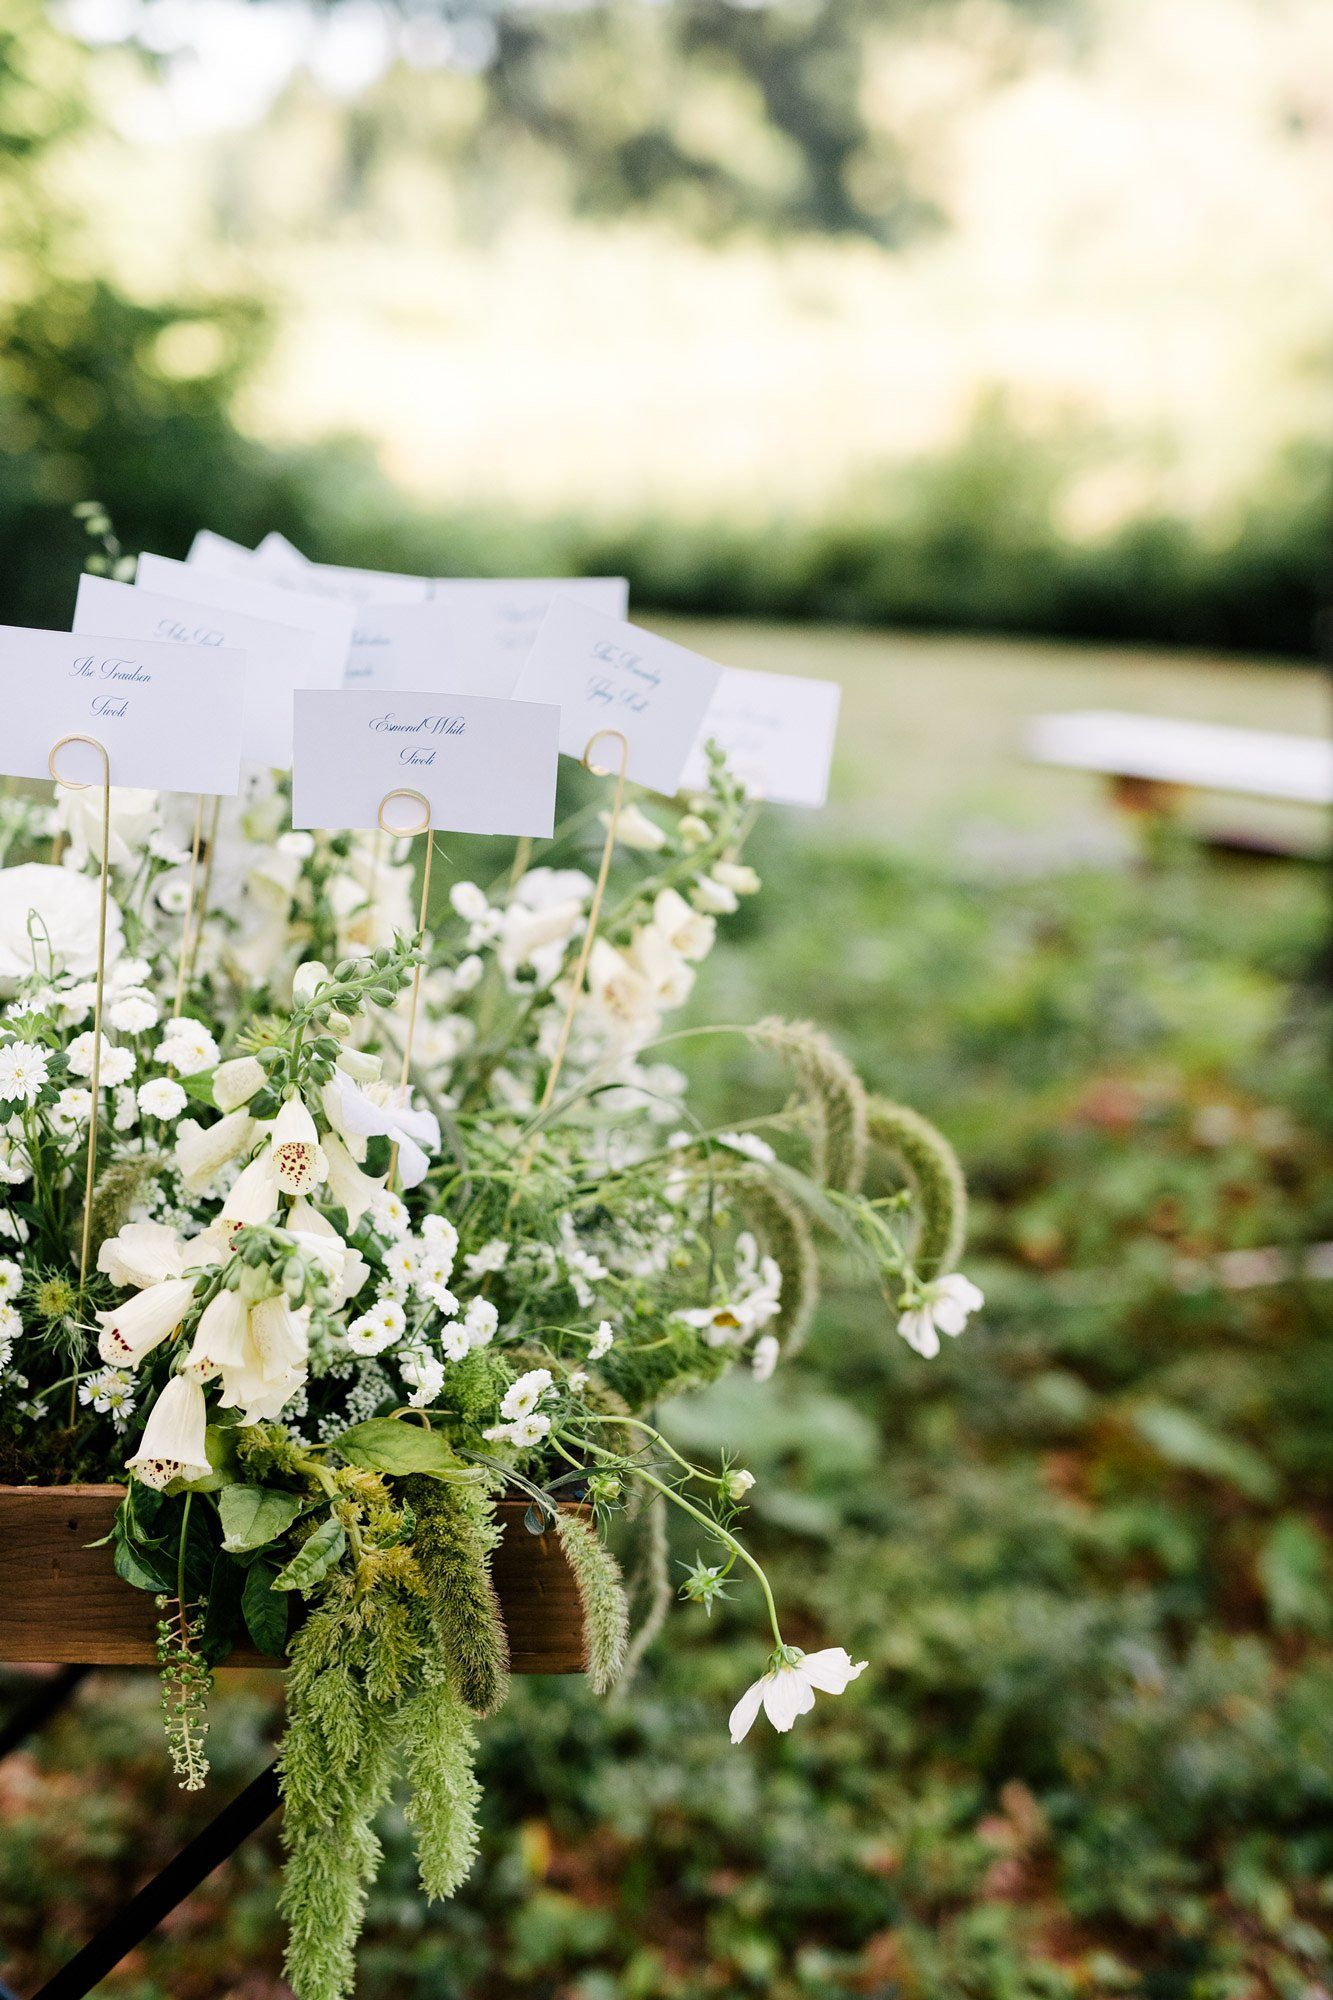 Wedding decoration ideas outside  Valerie Boster and Michael Macaulayus New Hampshire Wedding